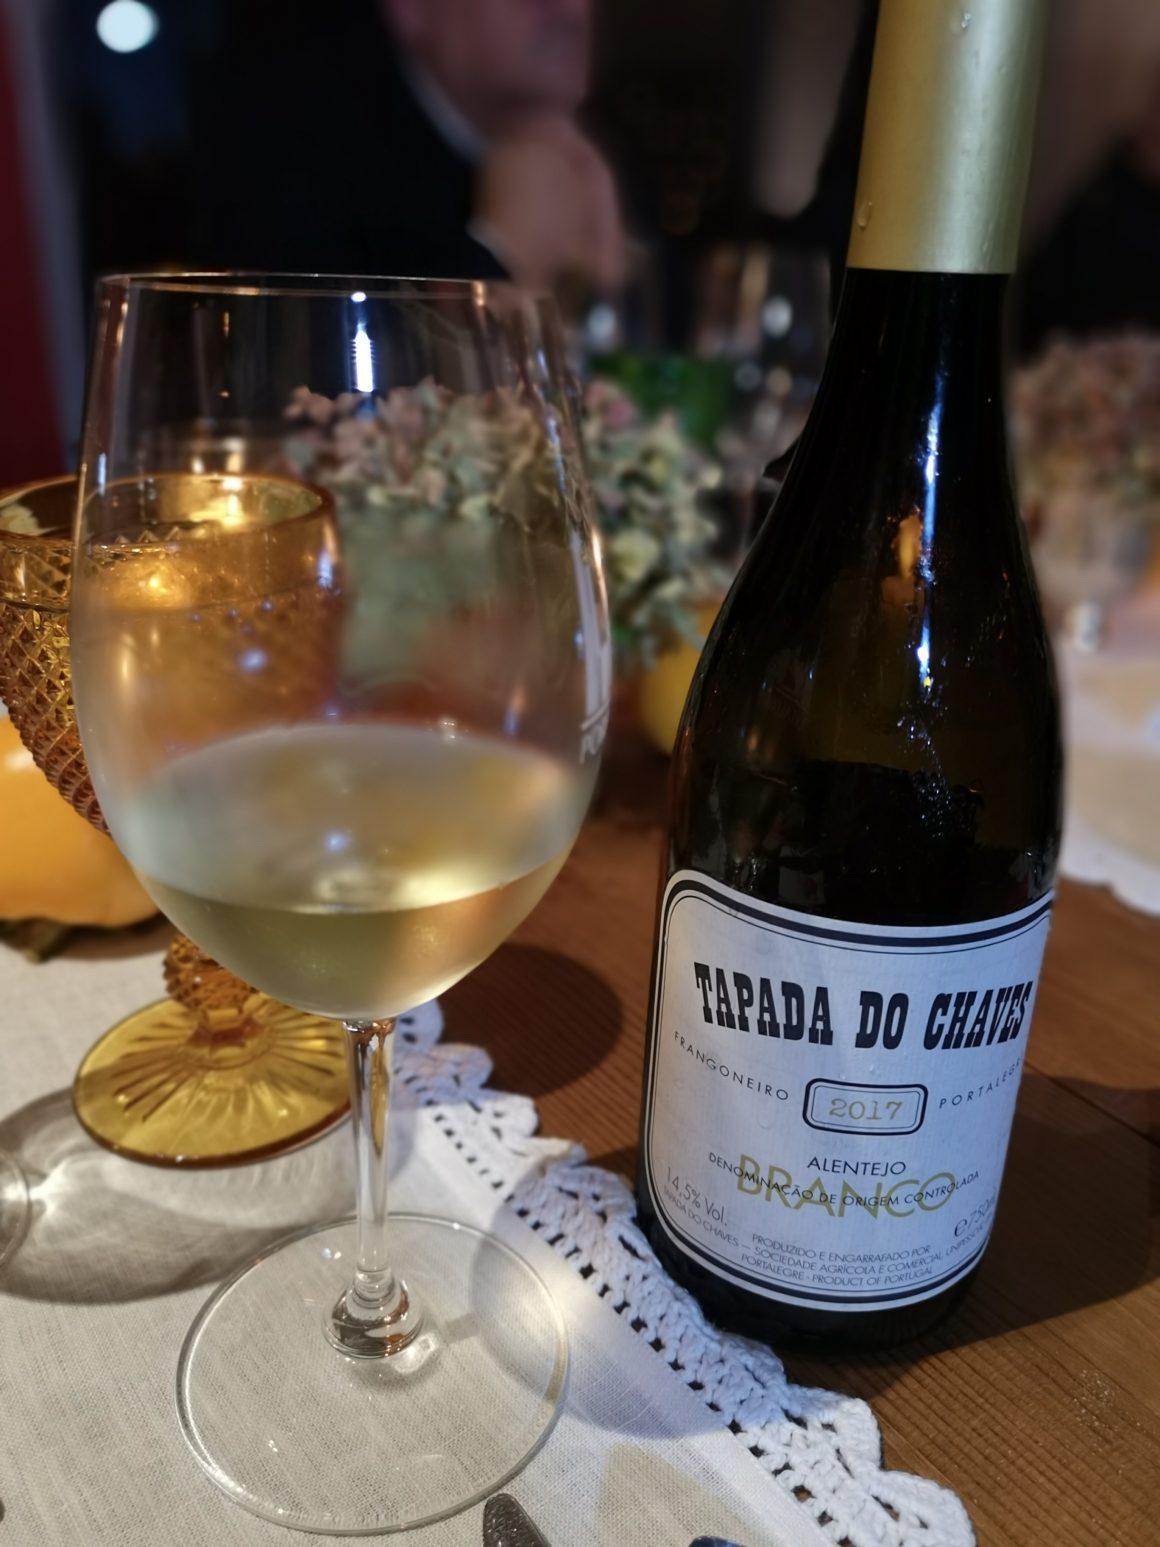 Portalegre - Viva o Vinho